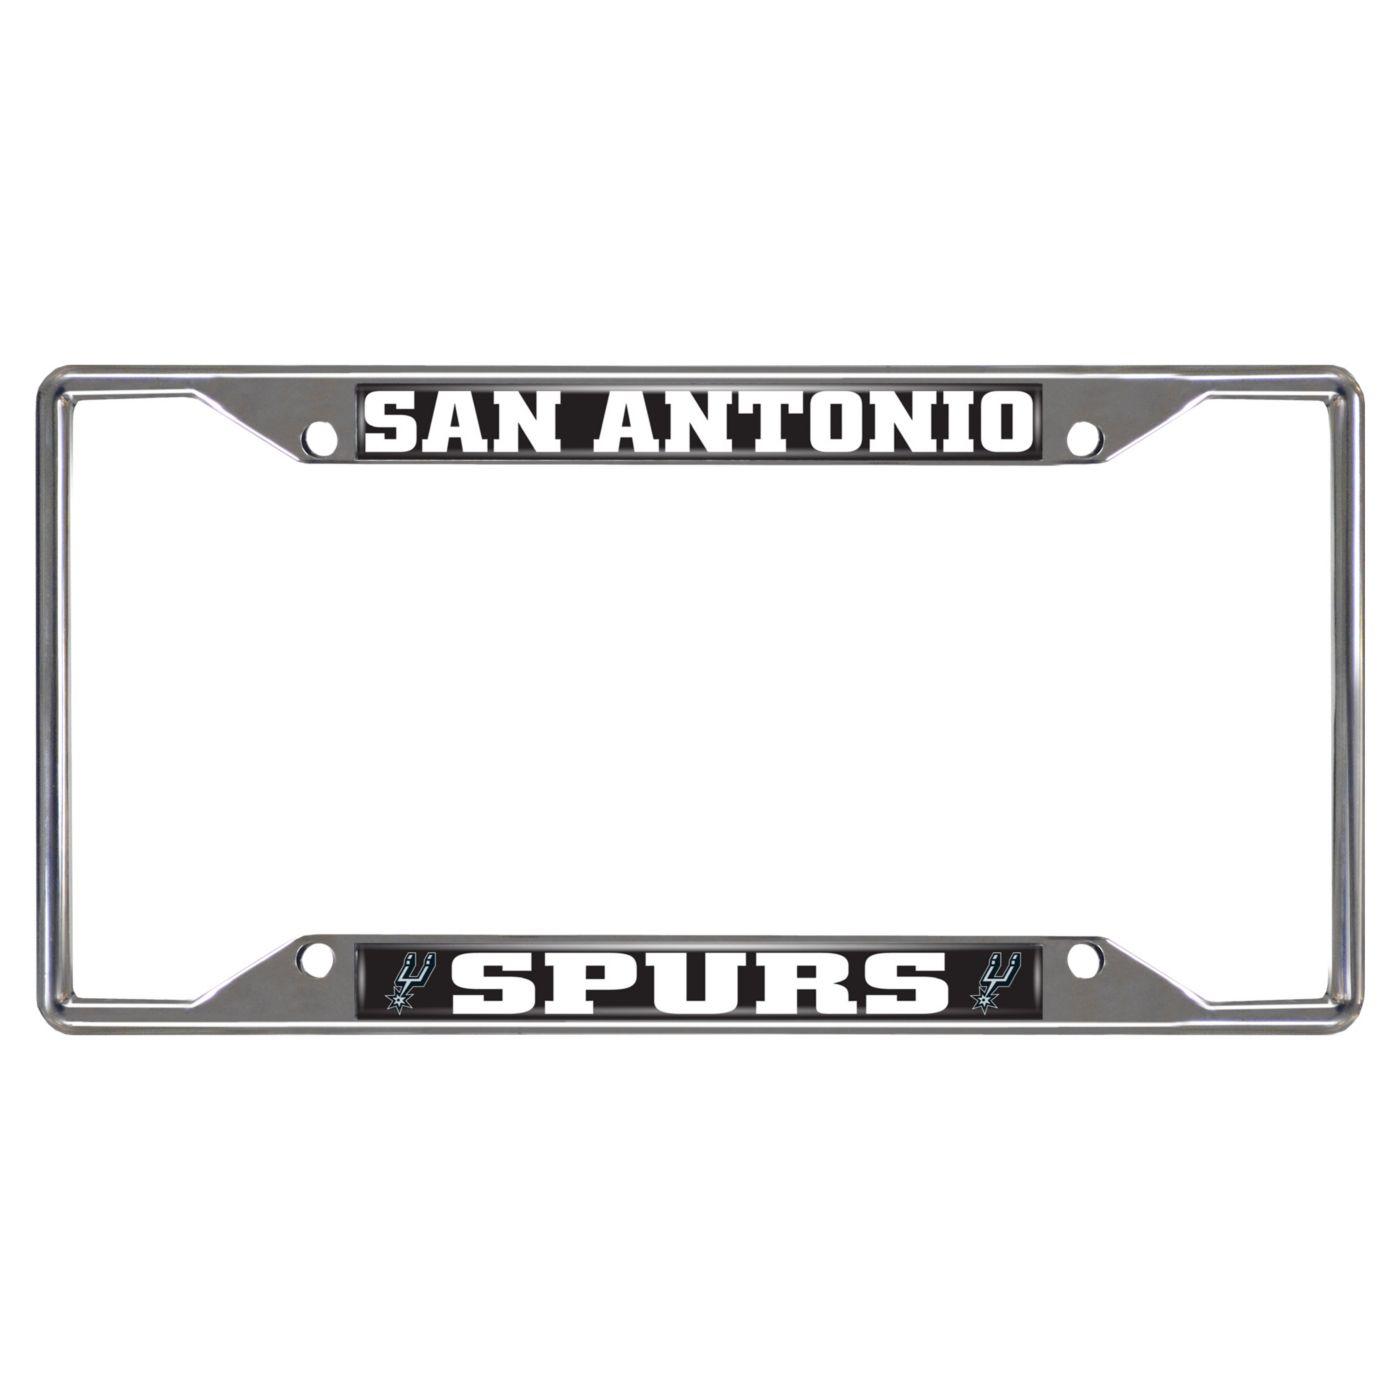 FANMATS San Antonio Spurs License Plate Frame